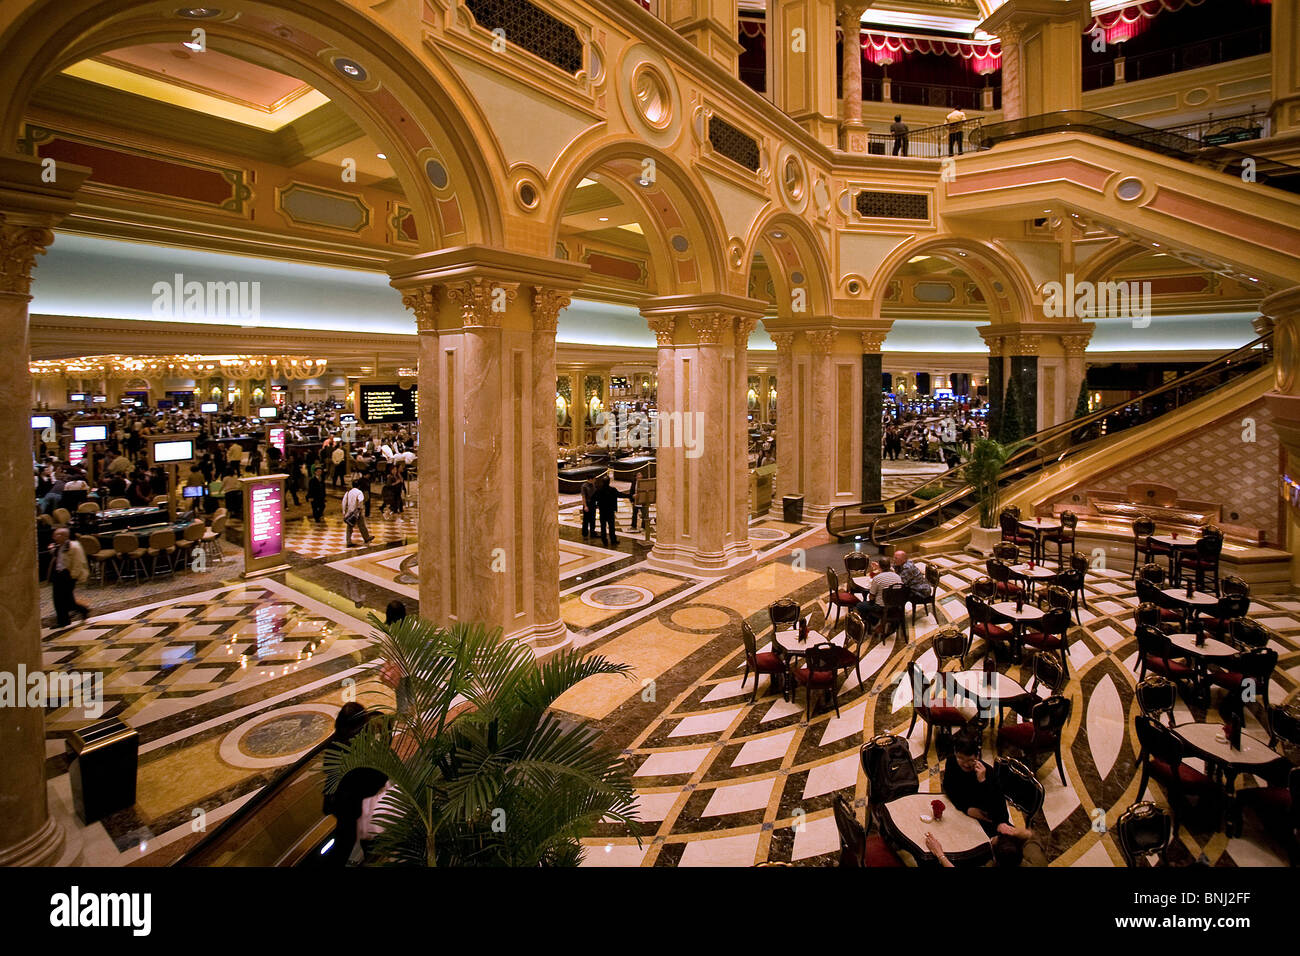 China Macao Macau Stadt schmückt das Venetian Casino Casino in Kurven Innendekoration Stockbild